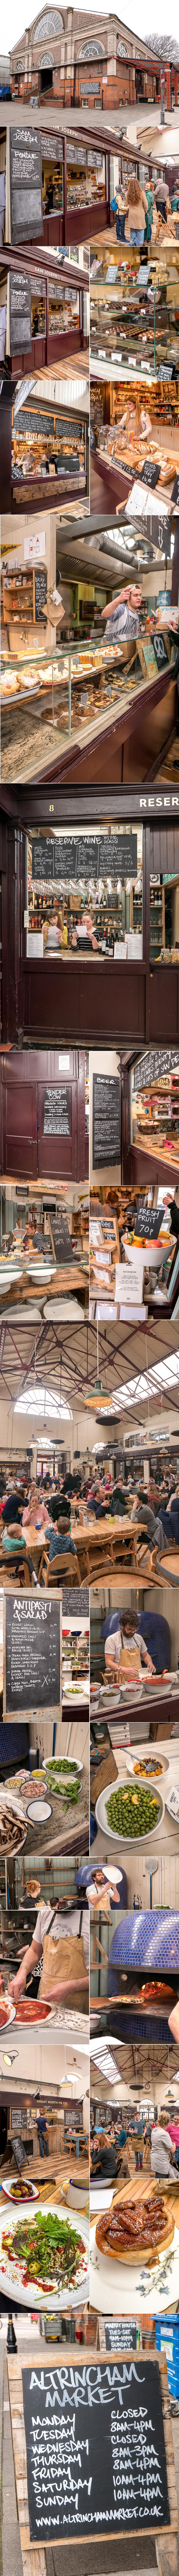 Altrincham Market Rita